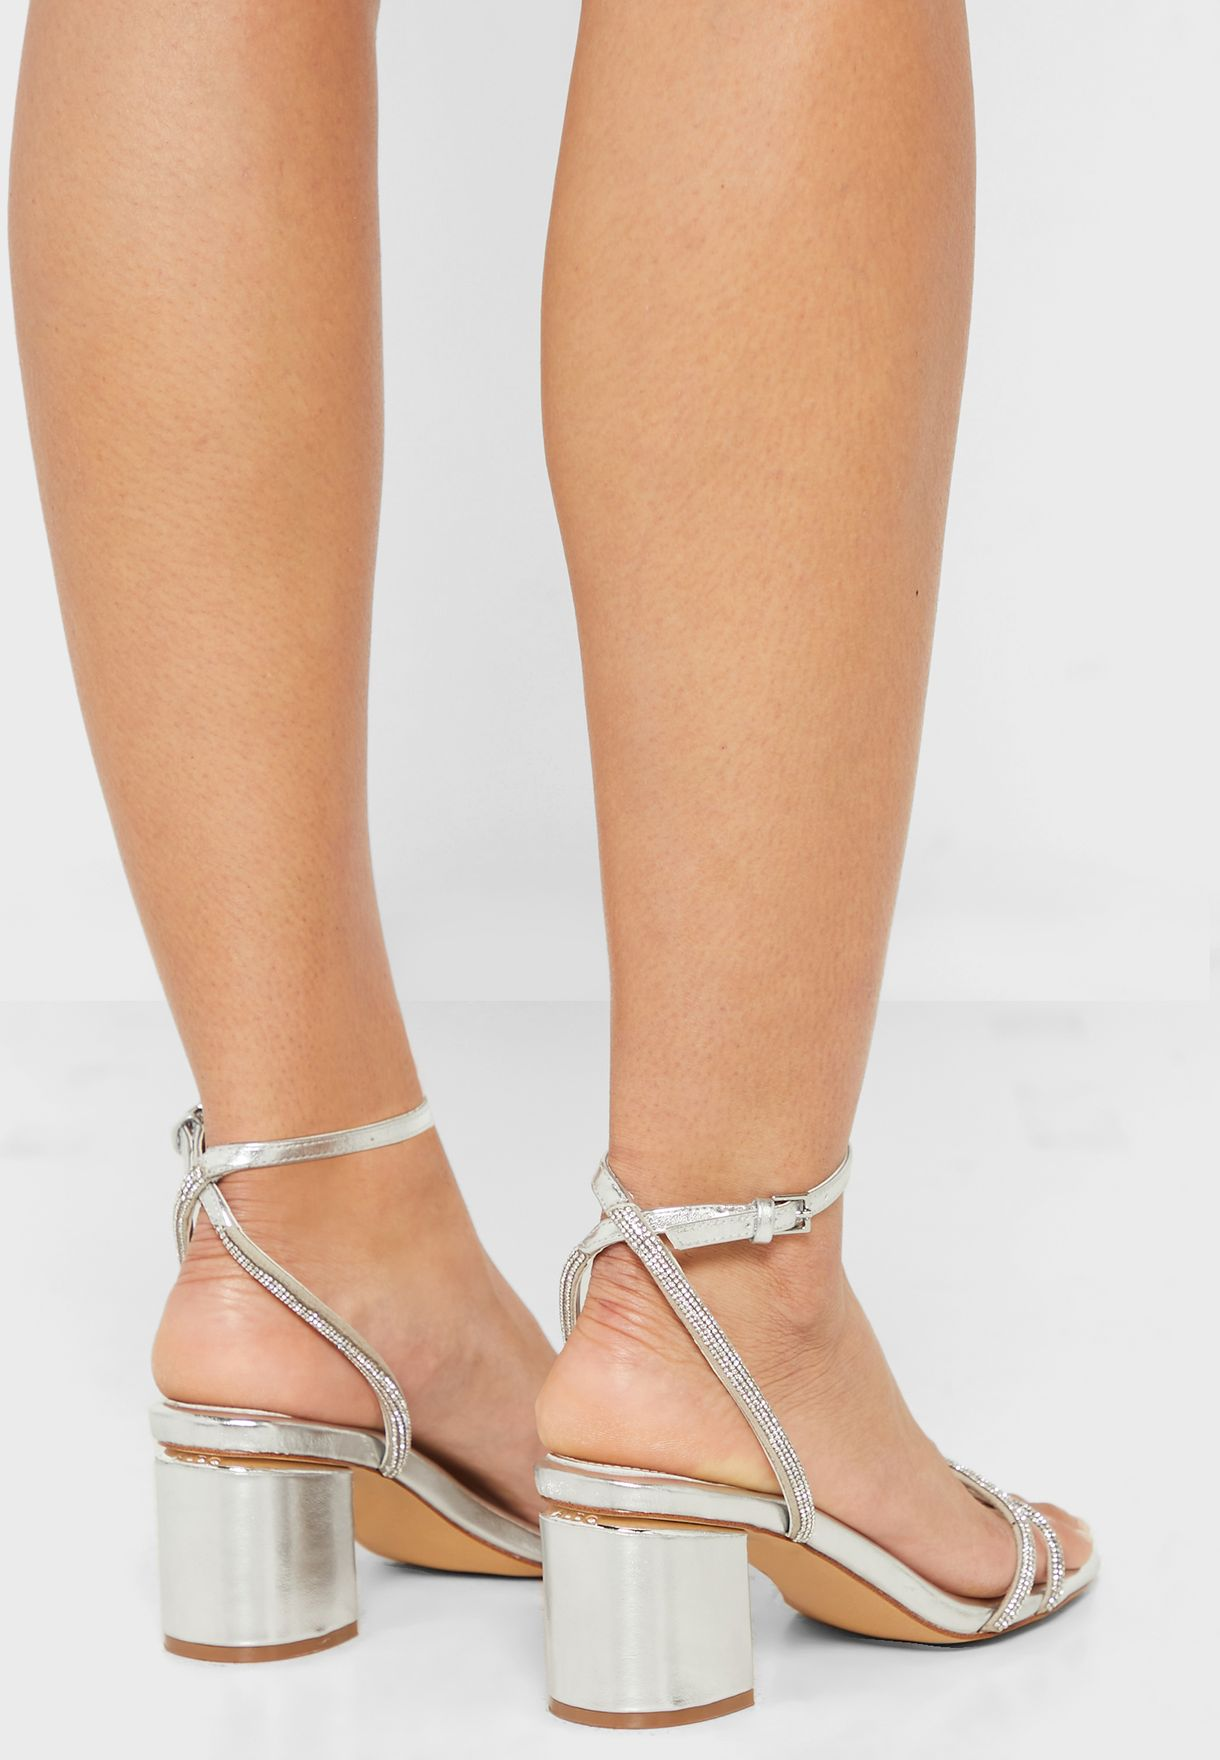 Miraydda Mid Heel Sandal